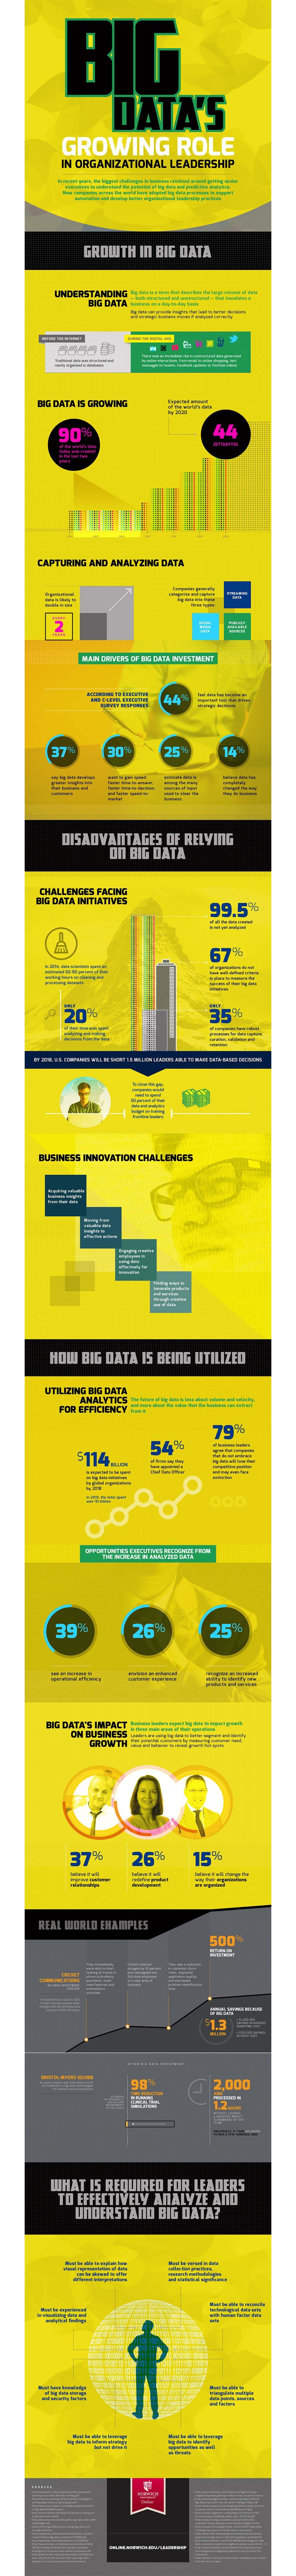 big data infographic image